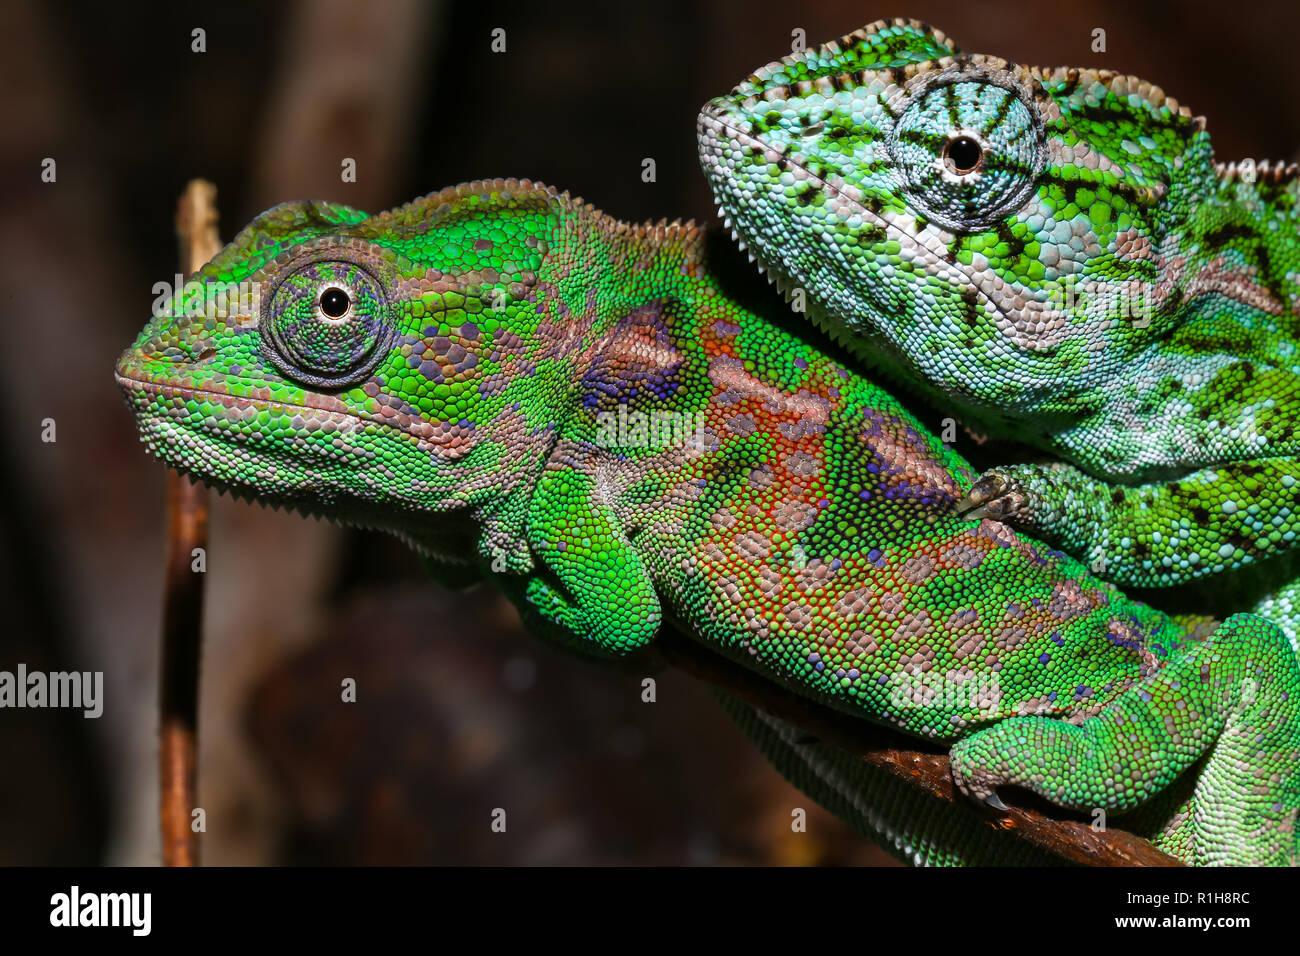 Two Jewel chameleons (Furcifer lateralis), male, Central Highlands, captive, Madagascar - Stock Image